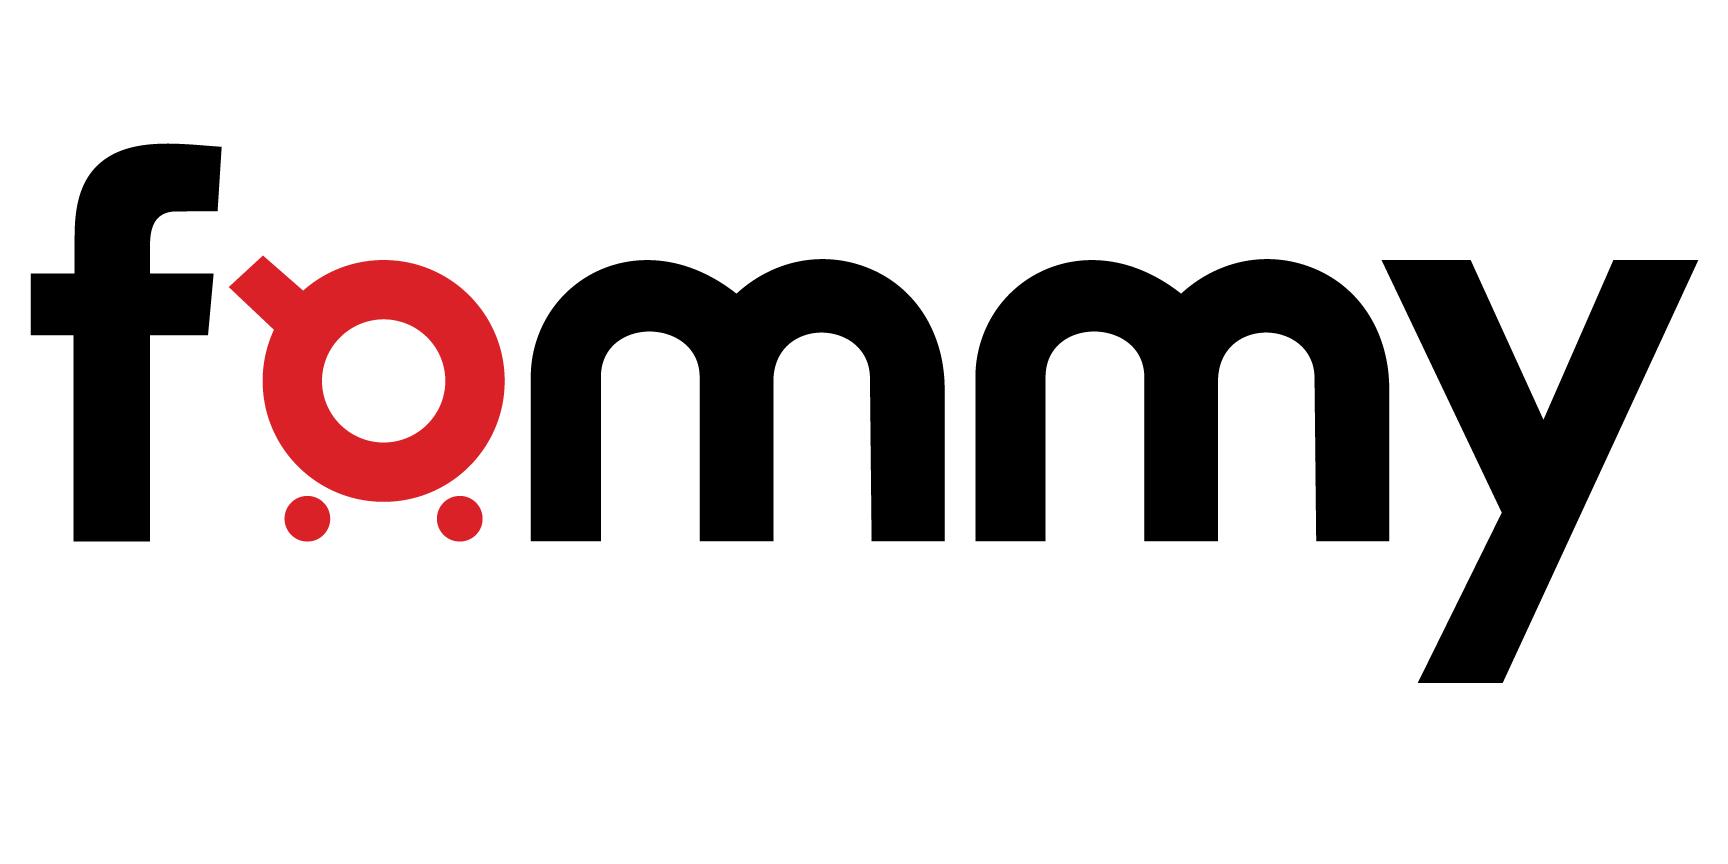 fommy.com - Premier Design Driven & Global Brand